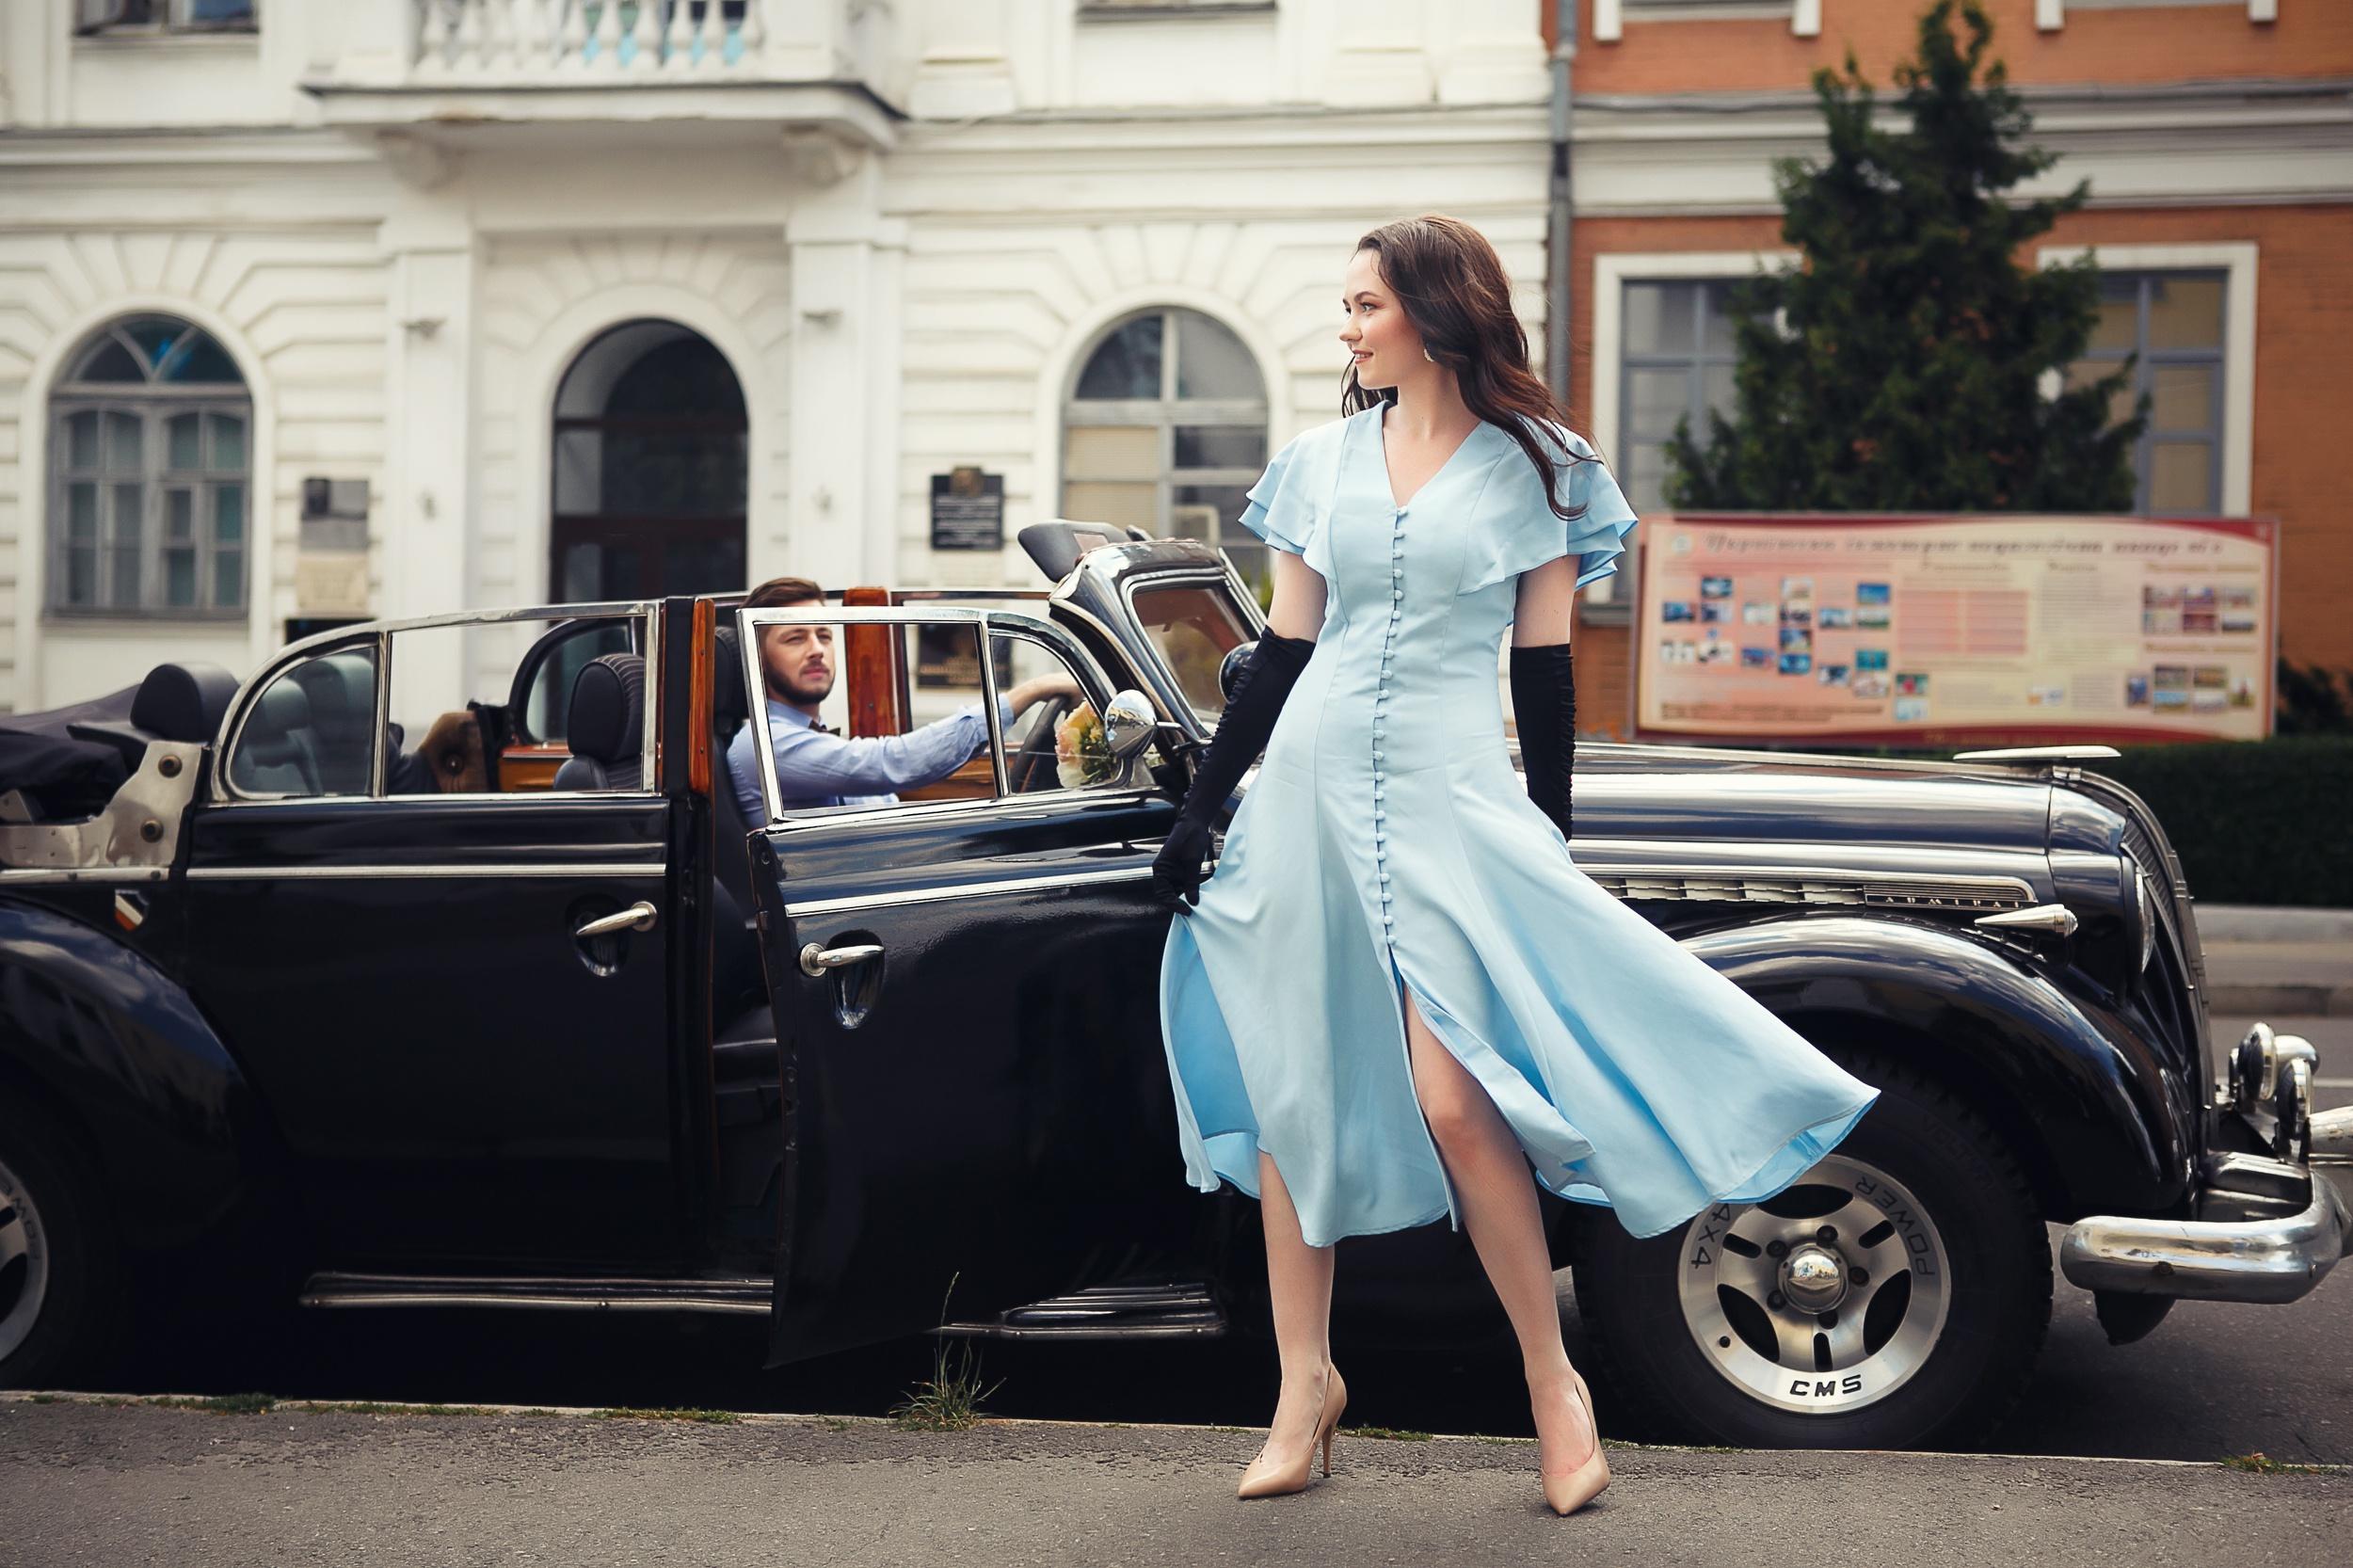 Women Men Urban Outdoors Women Outdoors Women With Cars Car Black Cars Vehicle Dress Blue Dress Glov 2500x1666